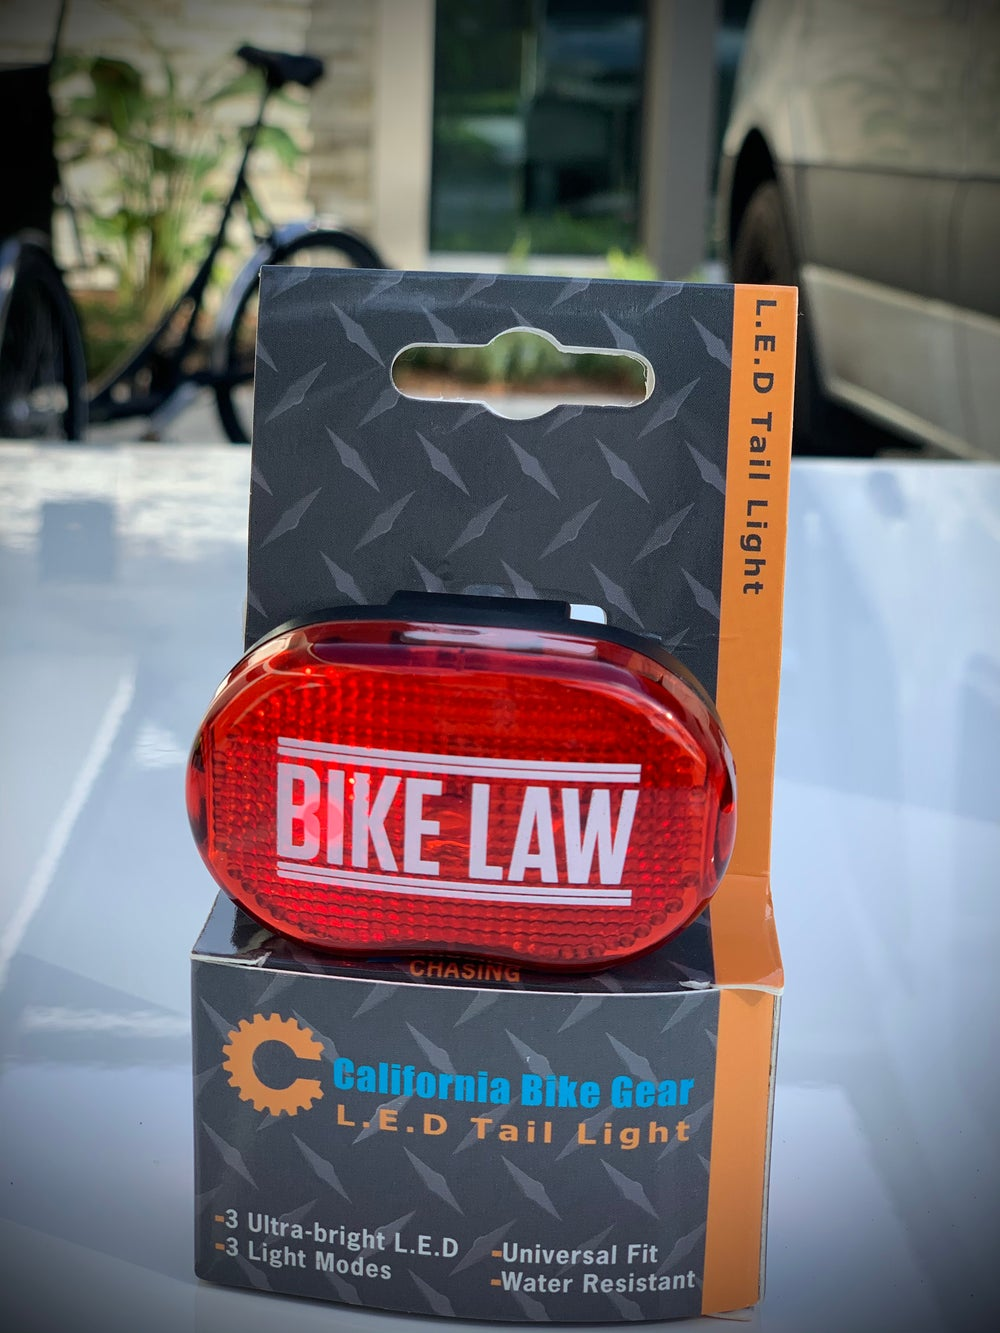 Image of Bike Law Bike Light